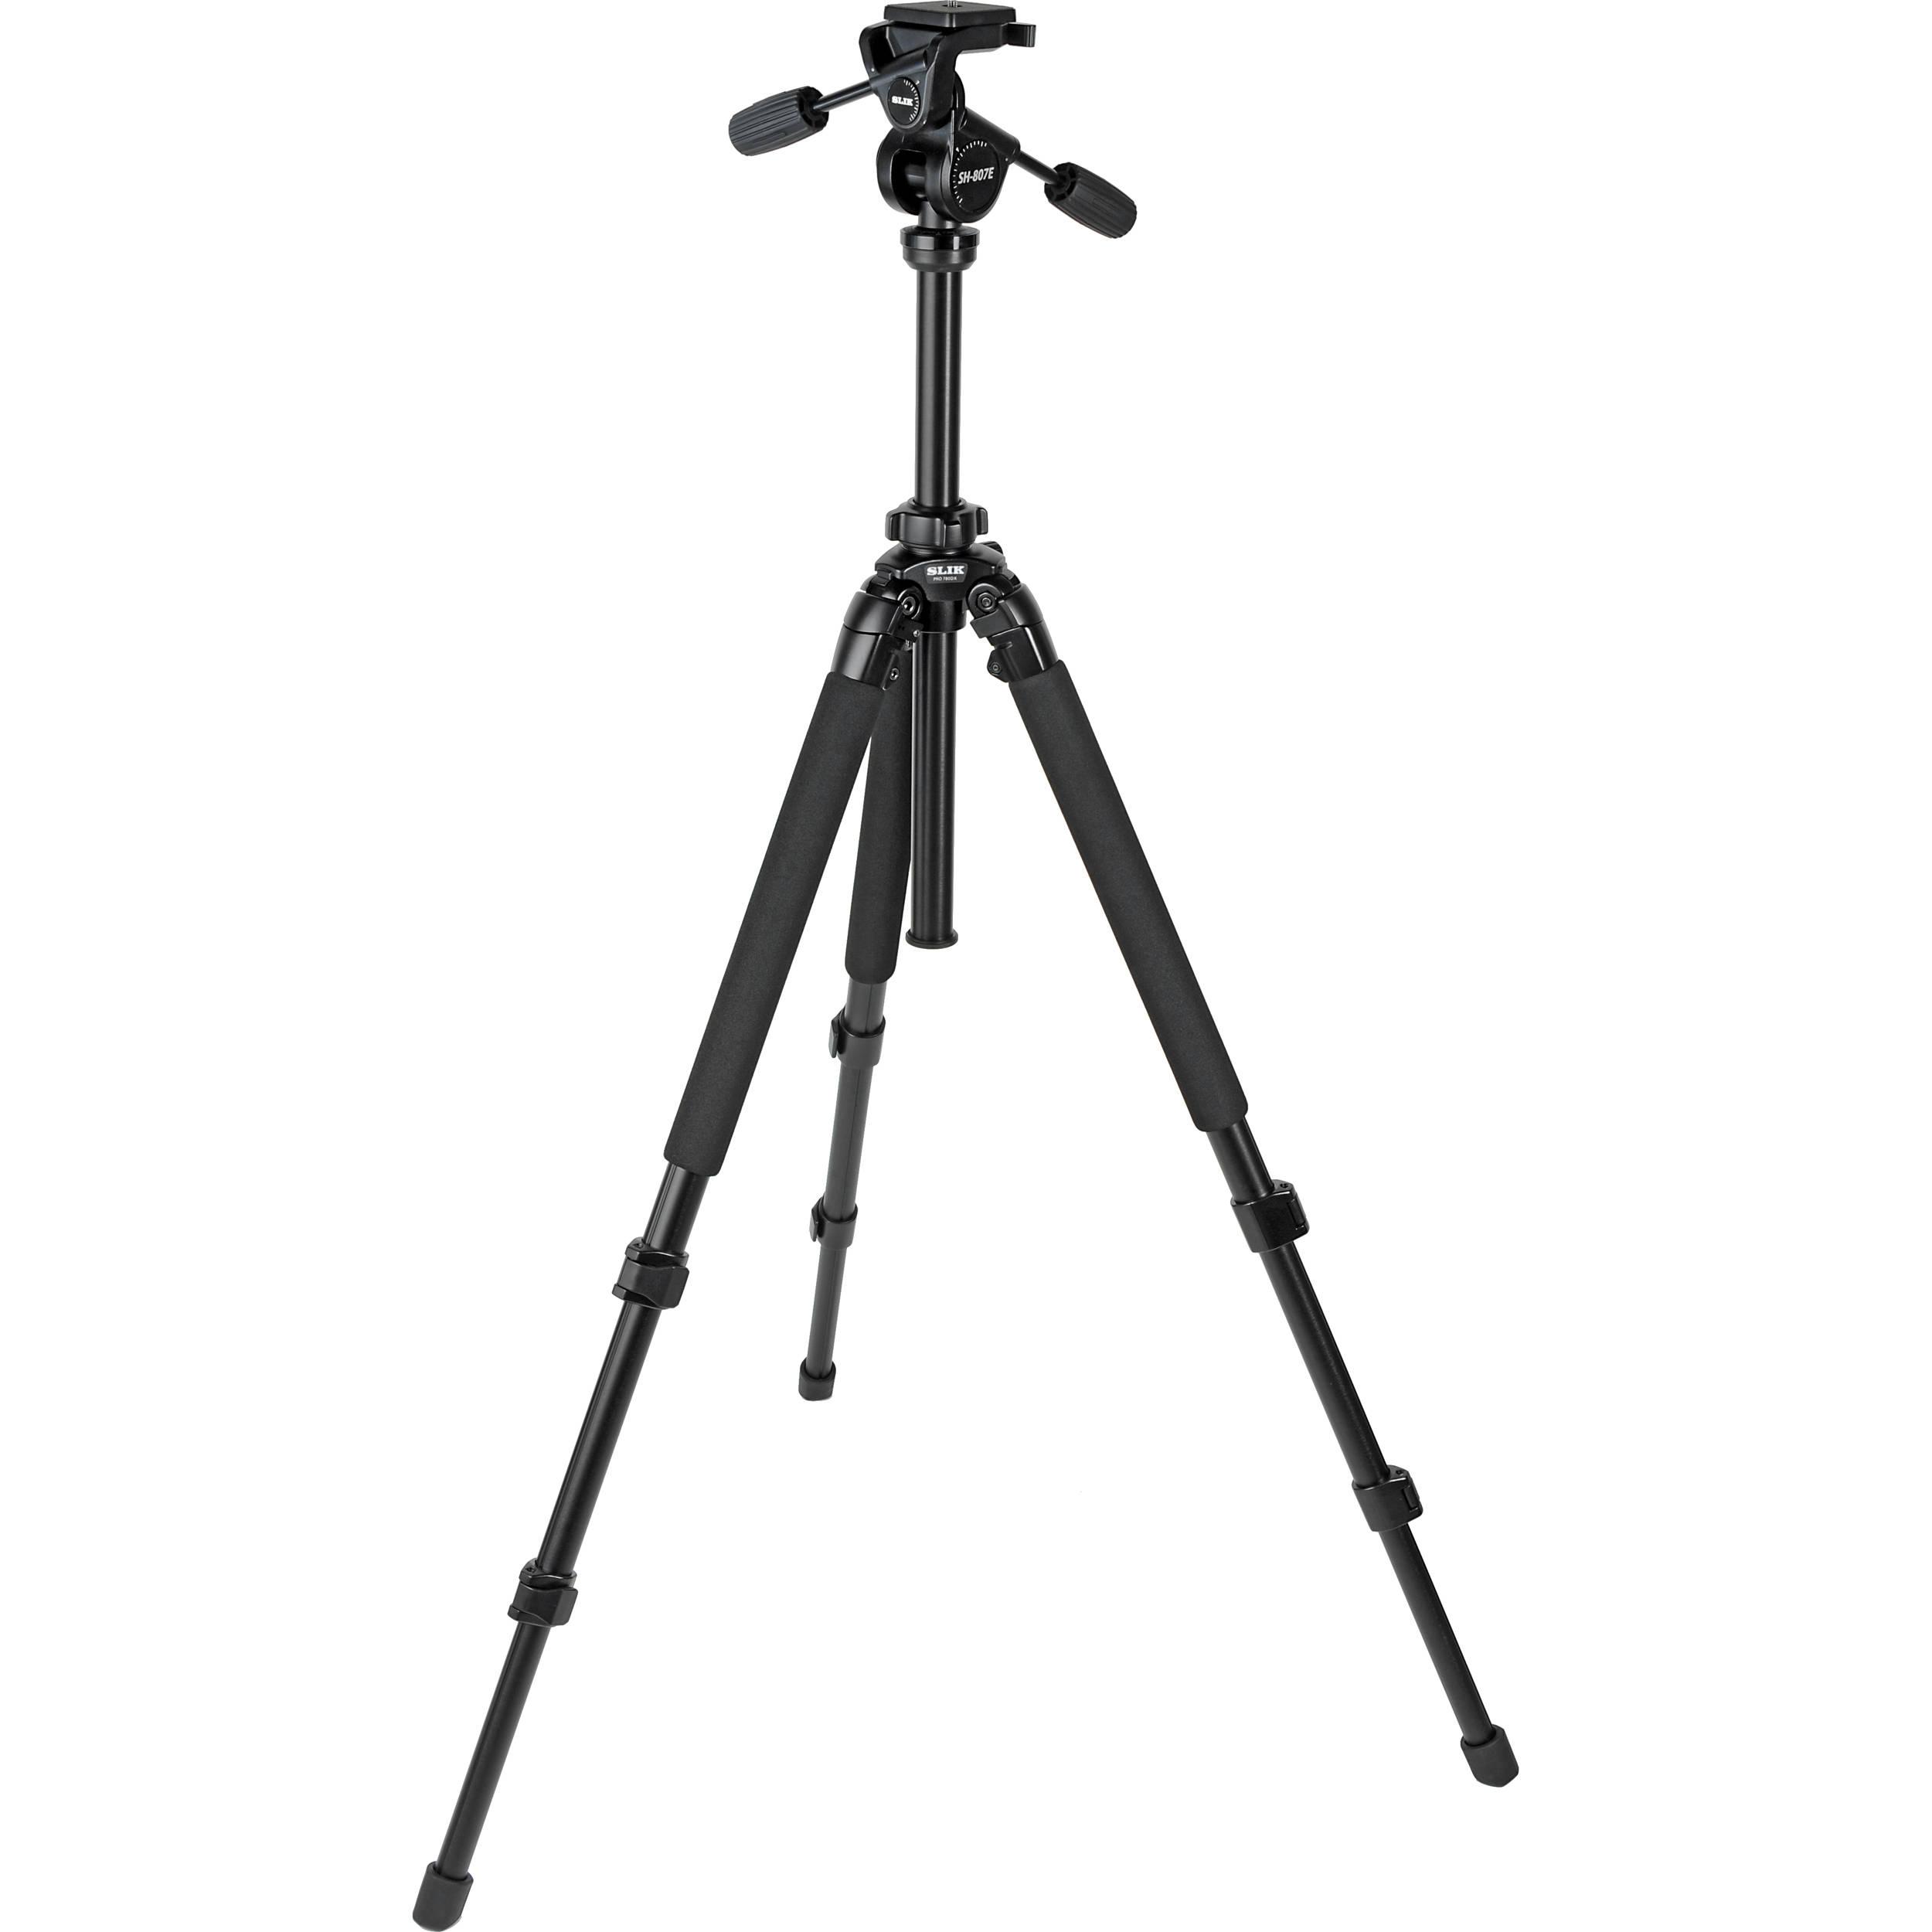 Slik Pro 780DX Tripod with 3-Way Head 615-780 B&H Photo Video